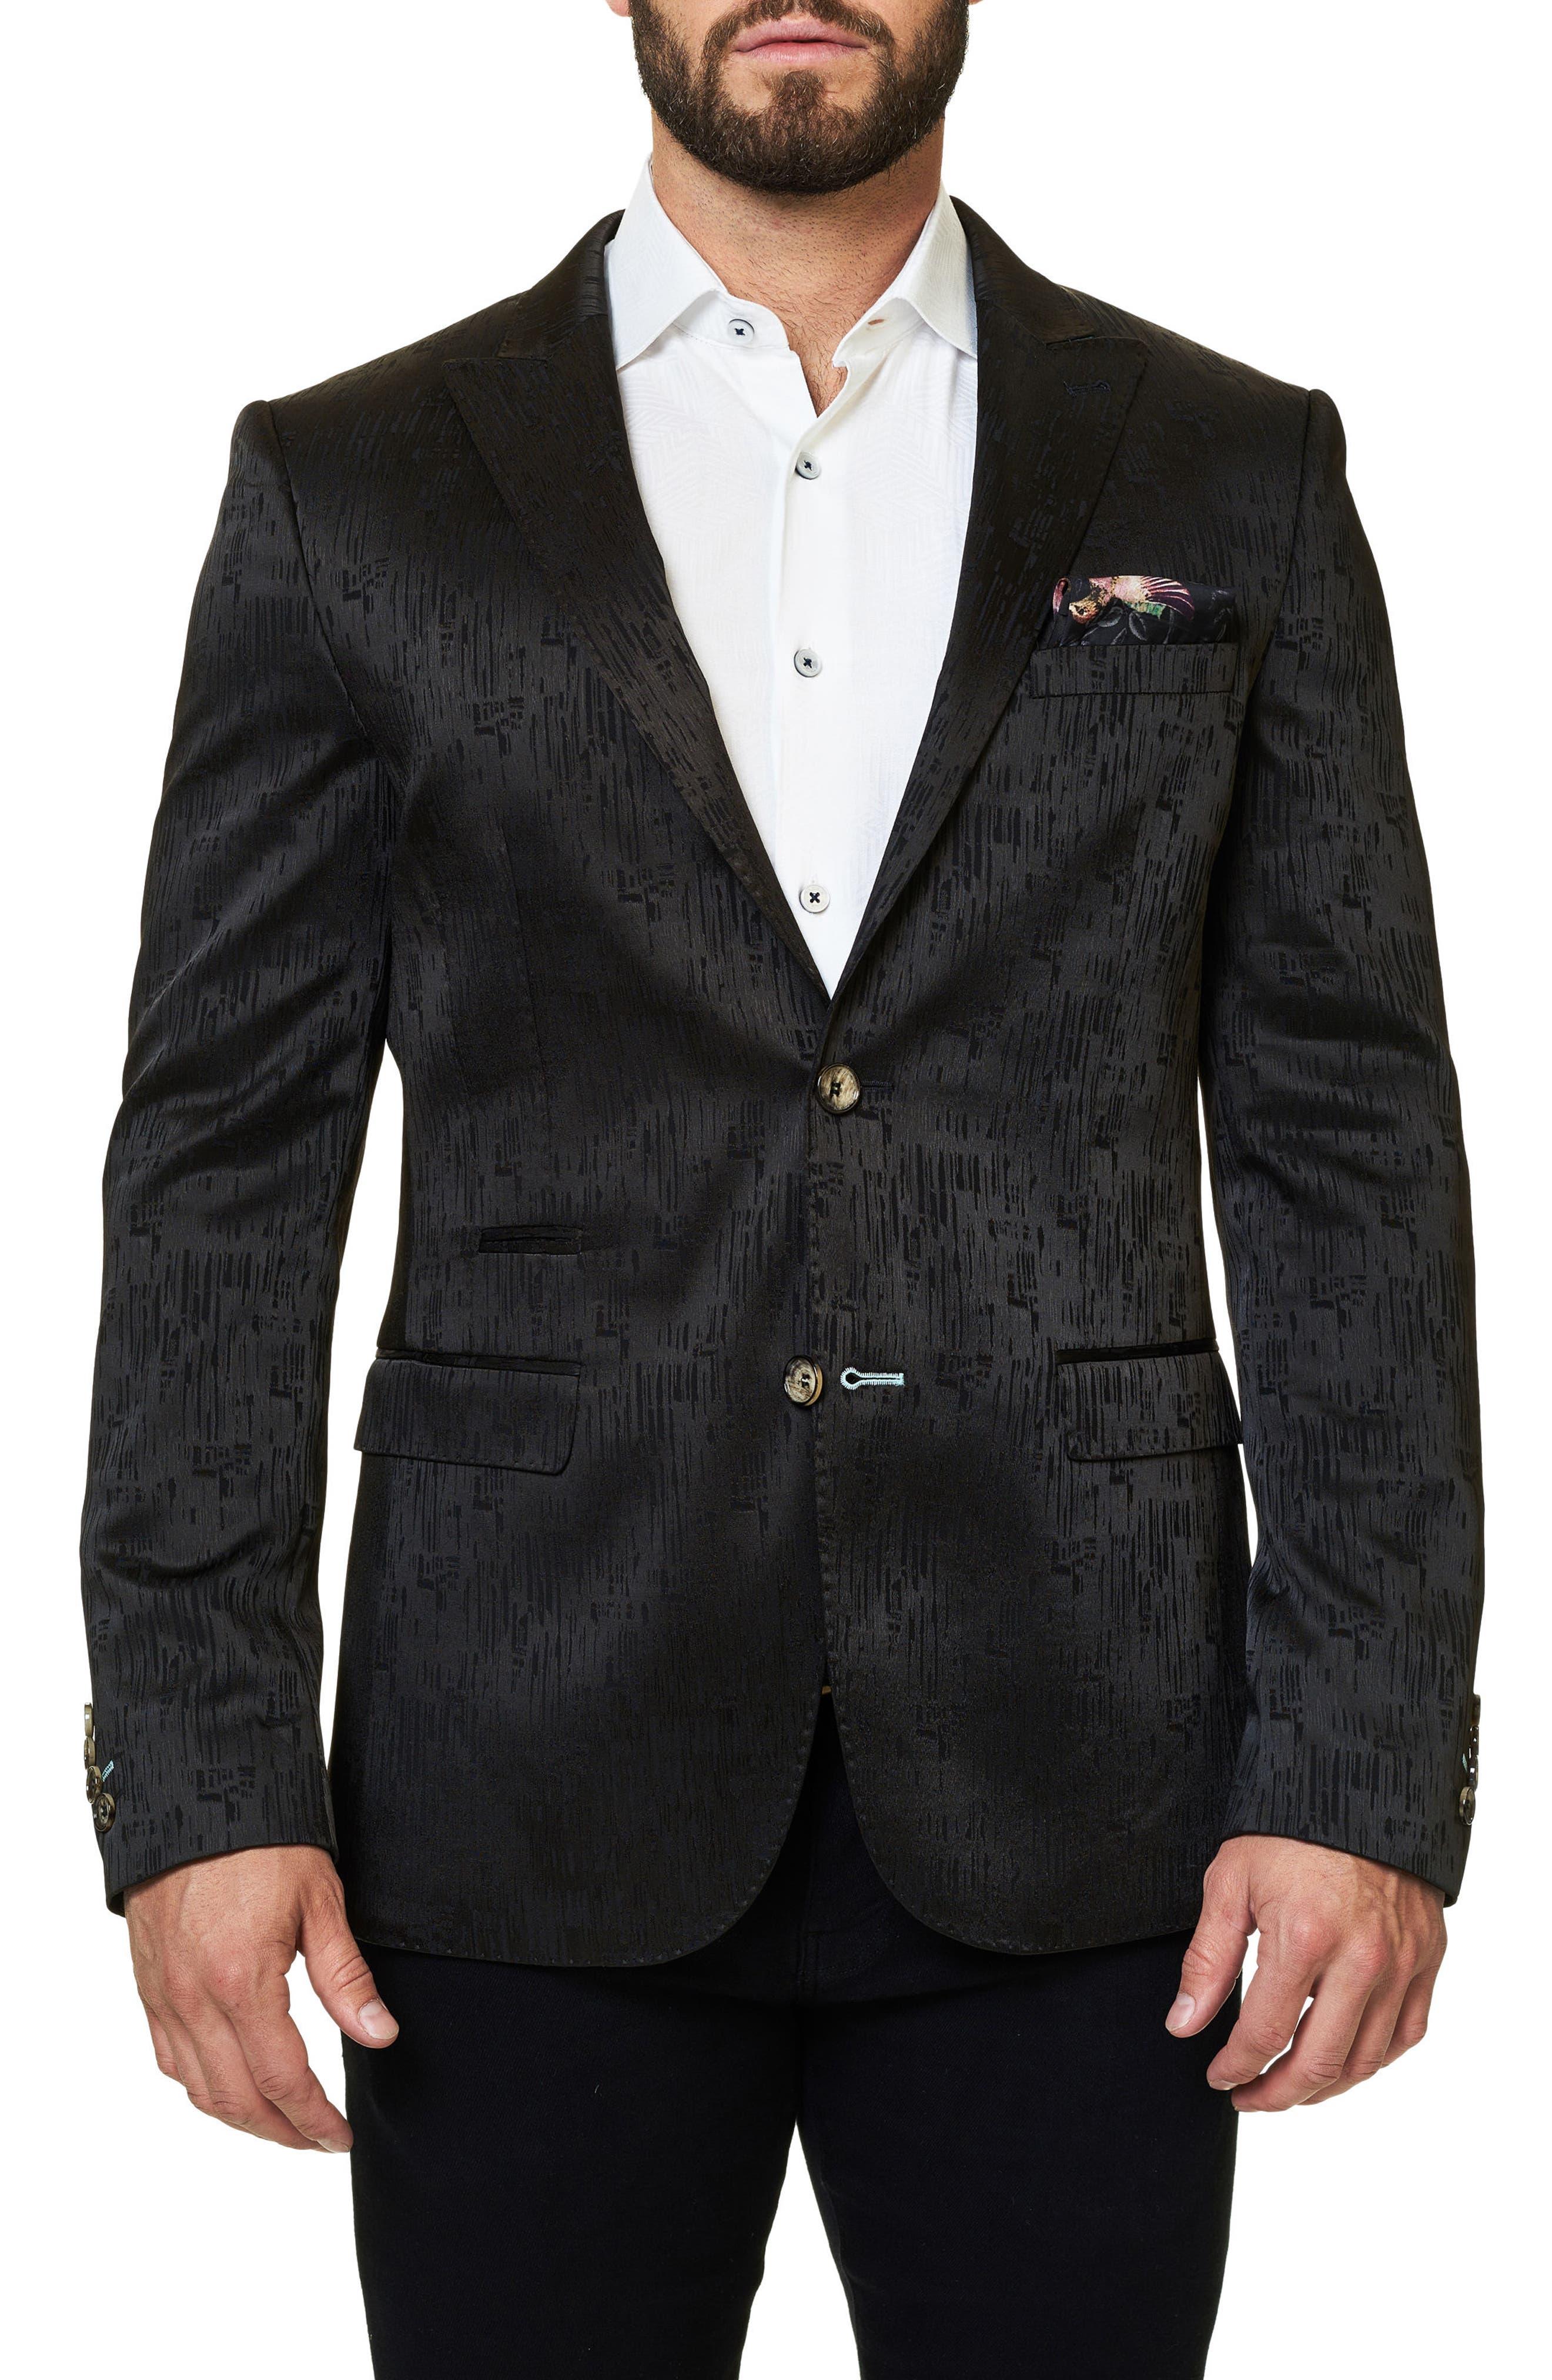 Maceoo Jacquard Sport Coat